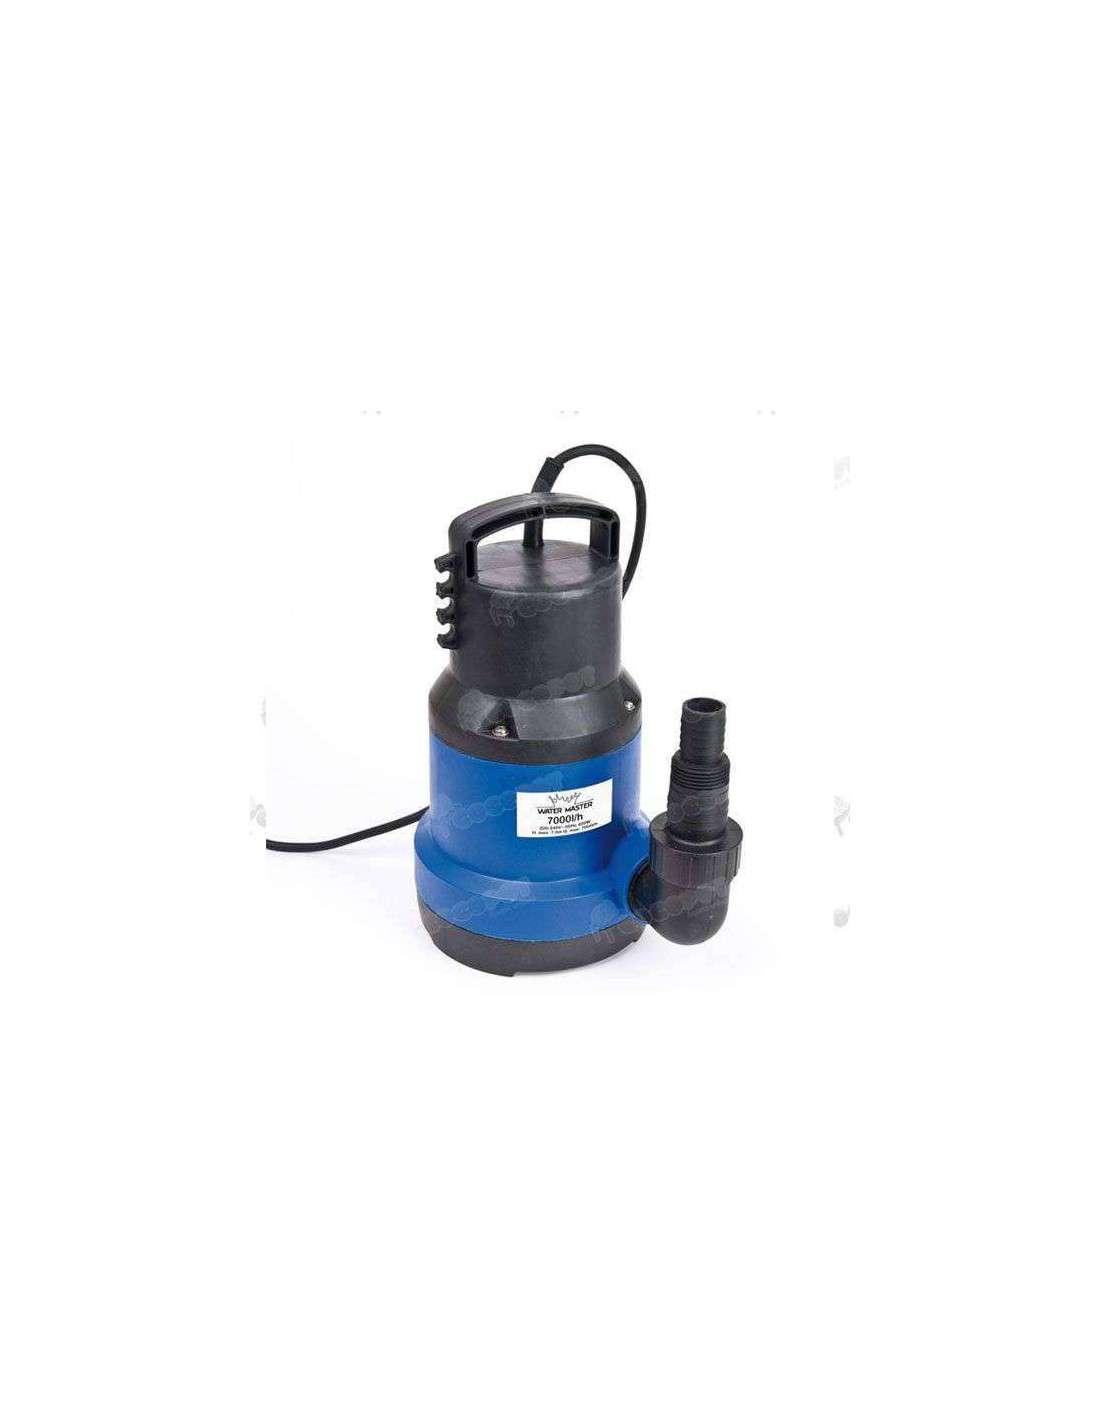 Bomba de riego 7000 litros hora cocopot huerto y jard n for Bomba de agua para riego de jardin